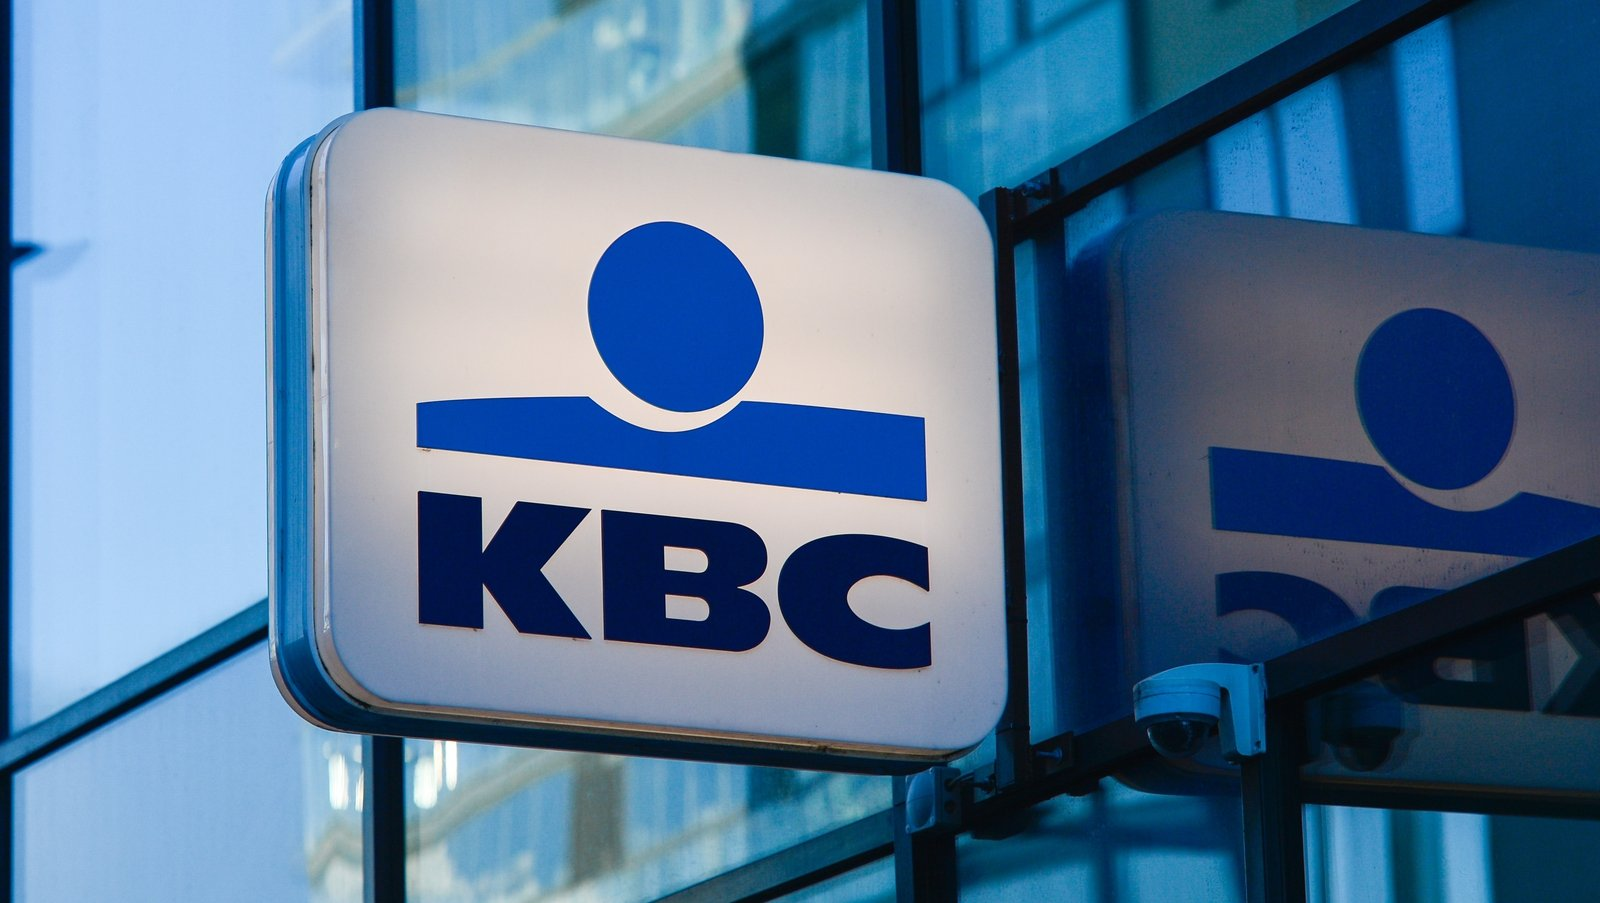 KBC Ireland sets aside €95m for potential loan losses